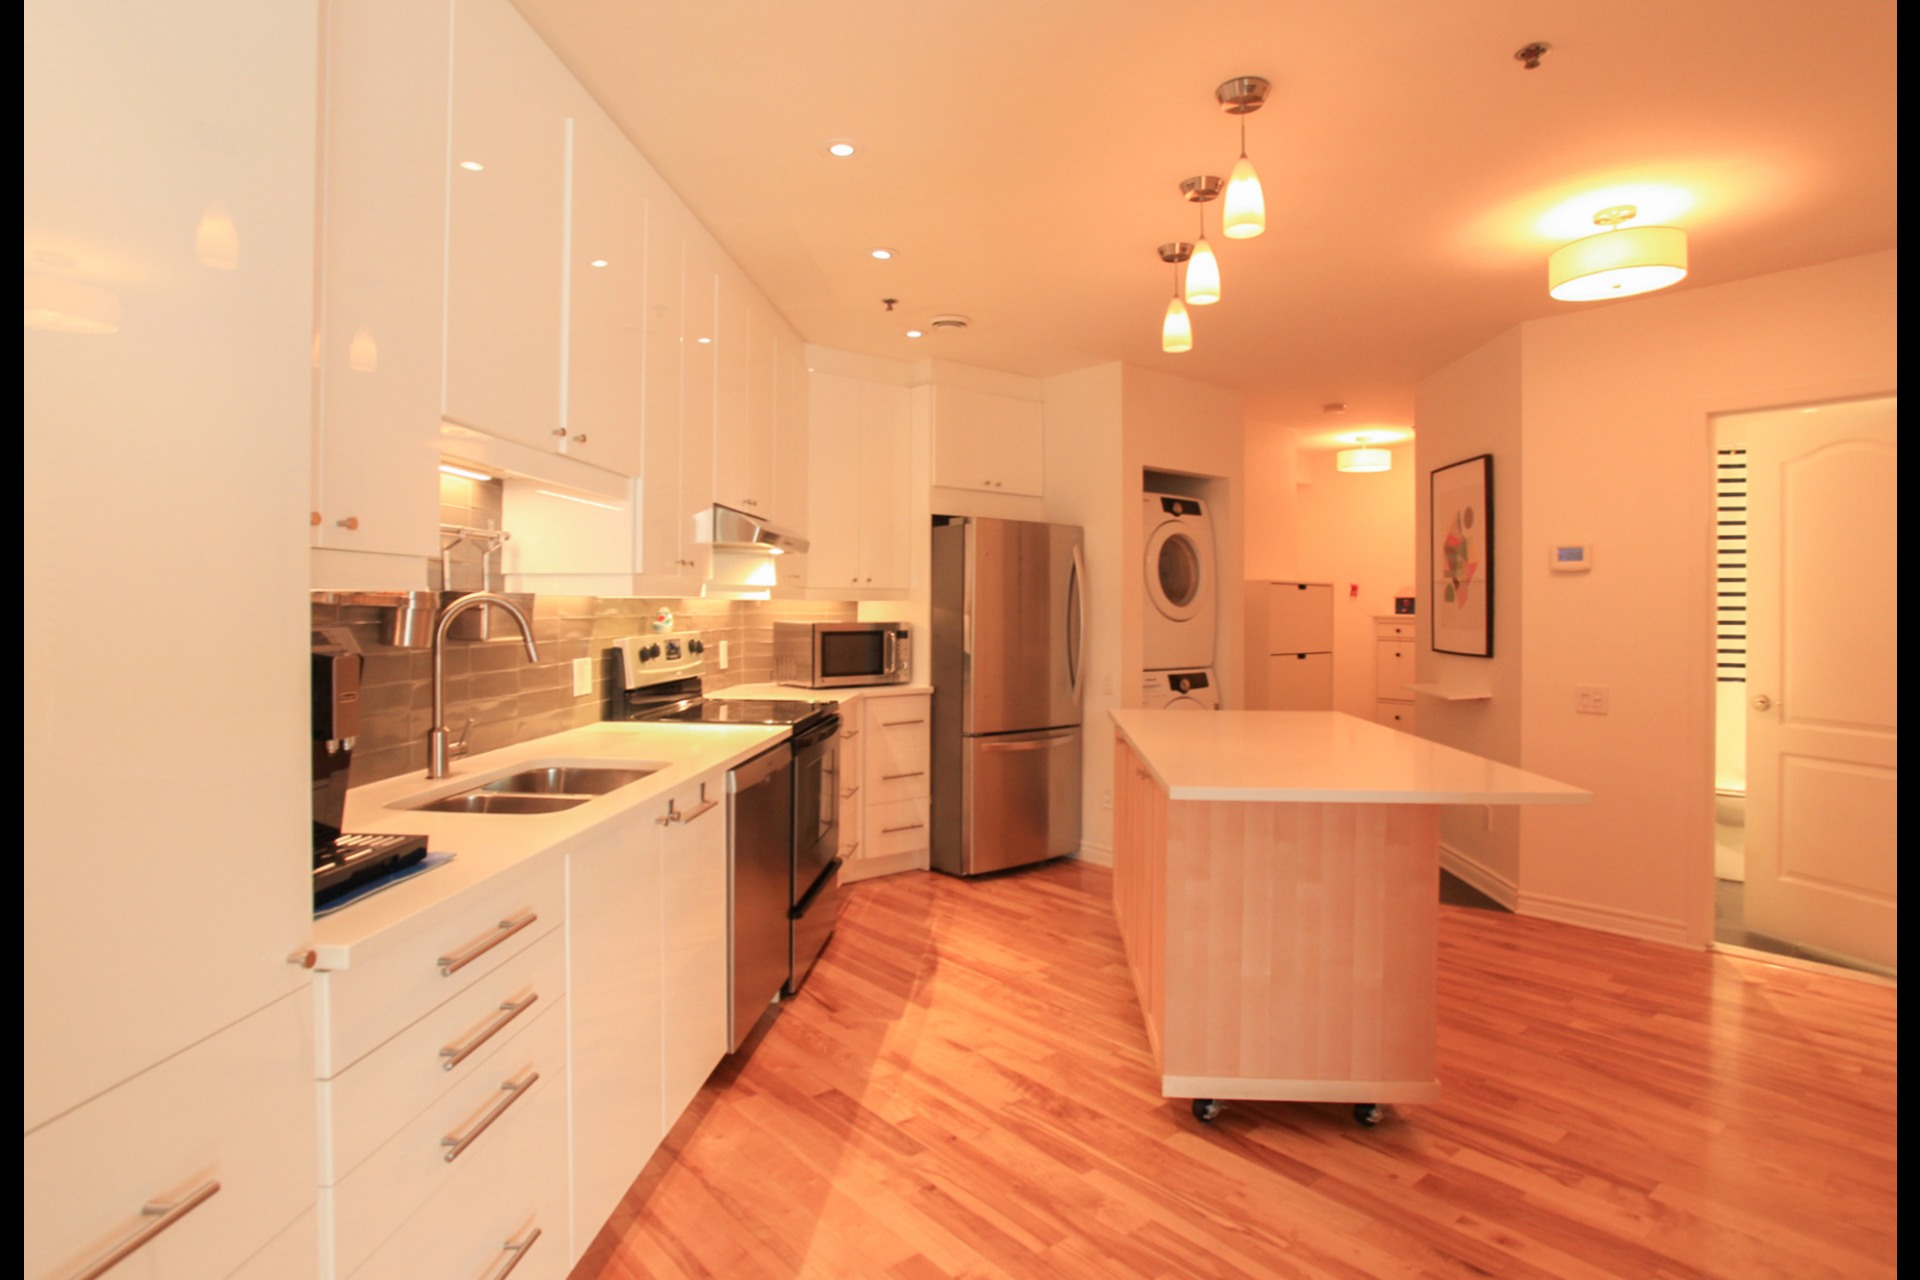 image 5 - 公寓 出租 Saint-Lambert